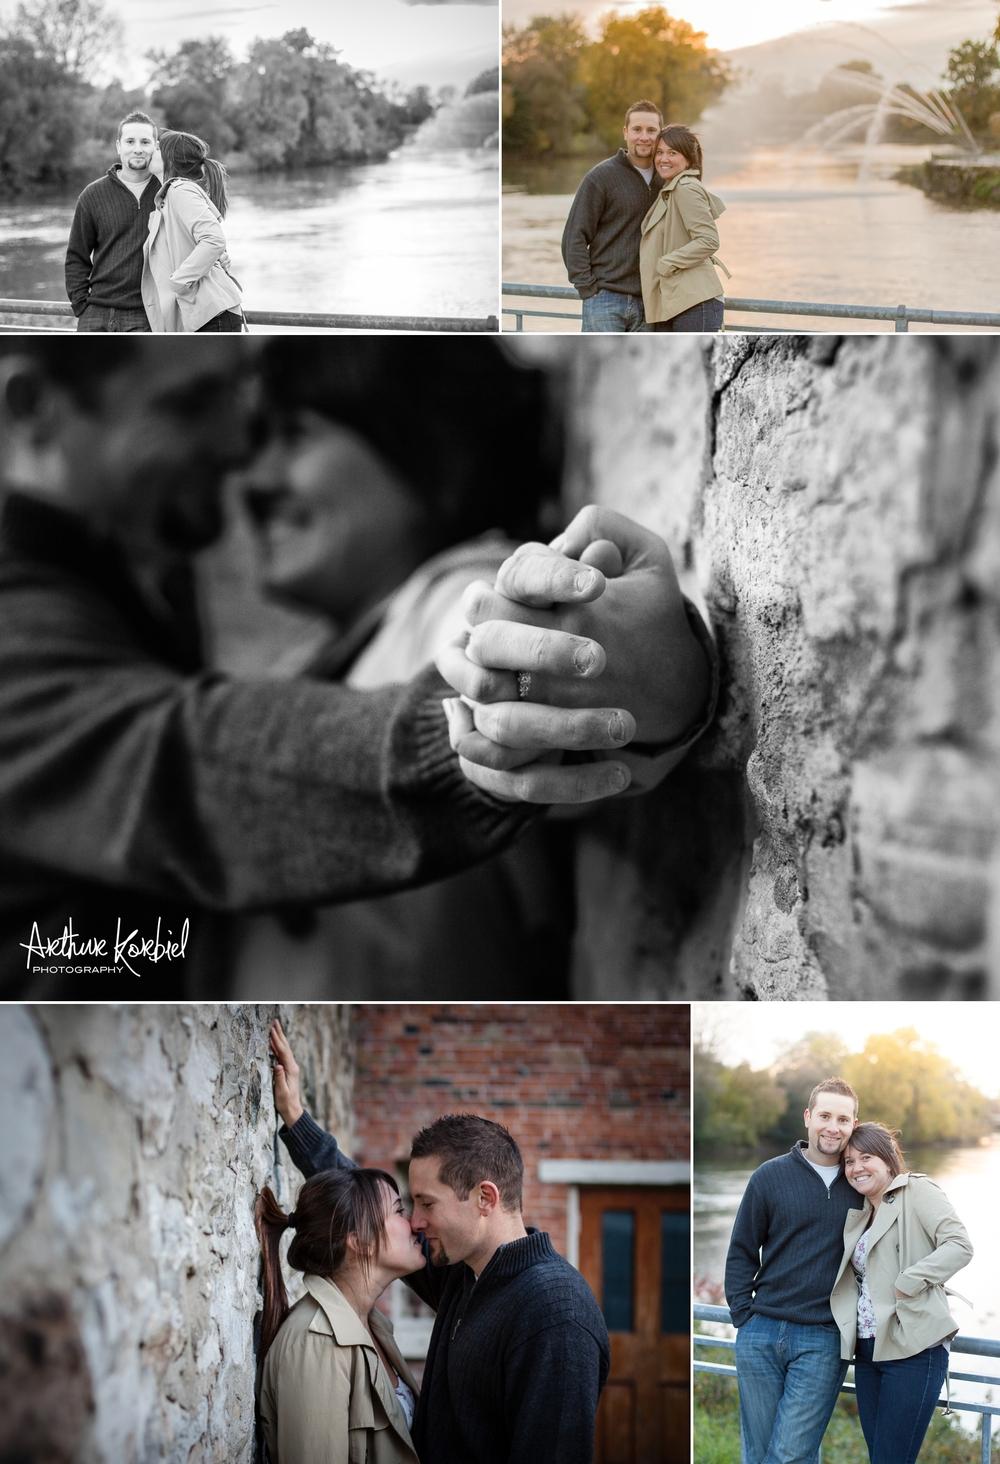 Arthur Korbiel Photography - London Engagement Photographer - Katie & Mike_006.jpg